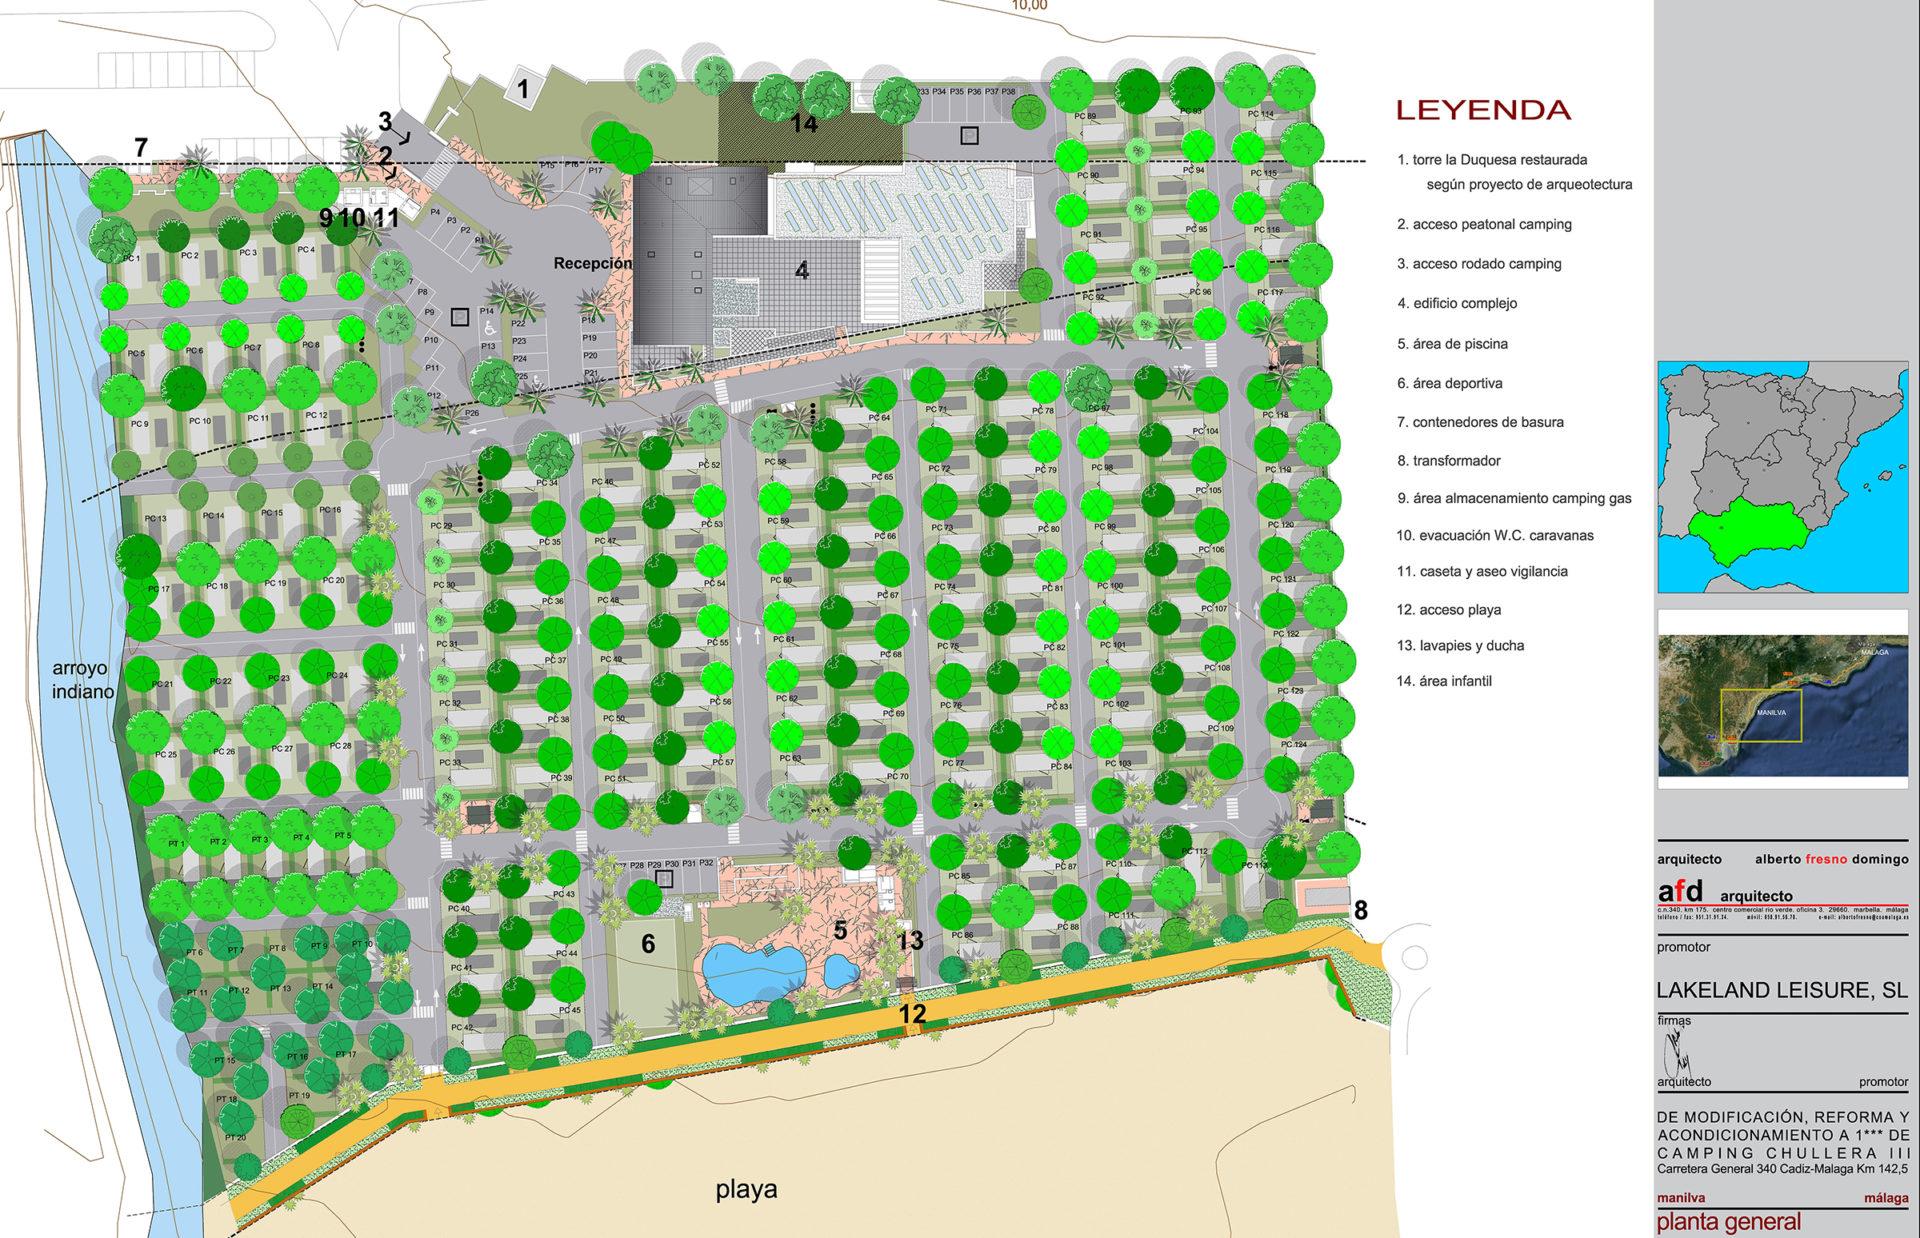 Planta General de jardín en Camping Chullera, Manilva, Málaga